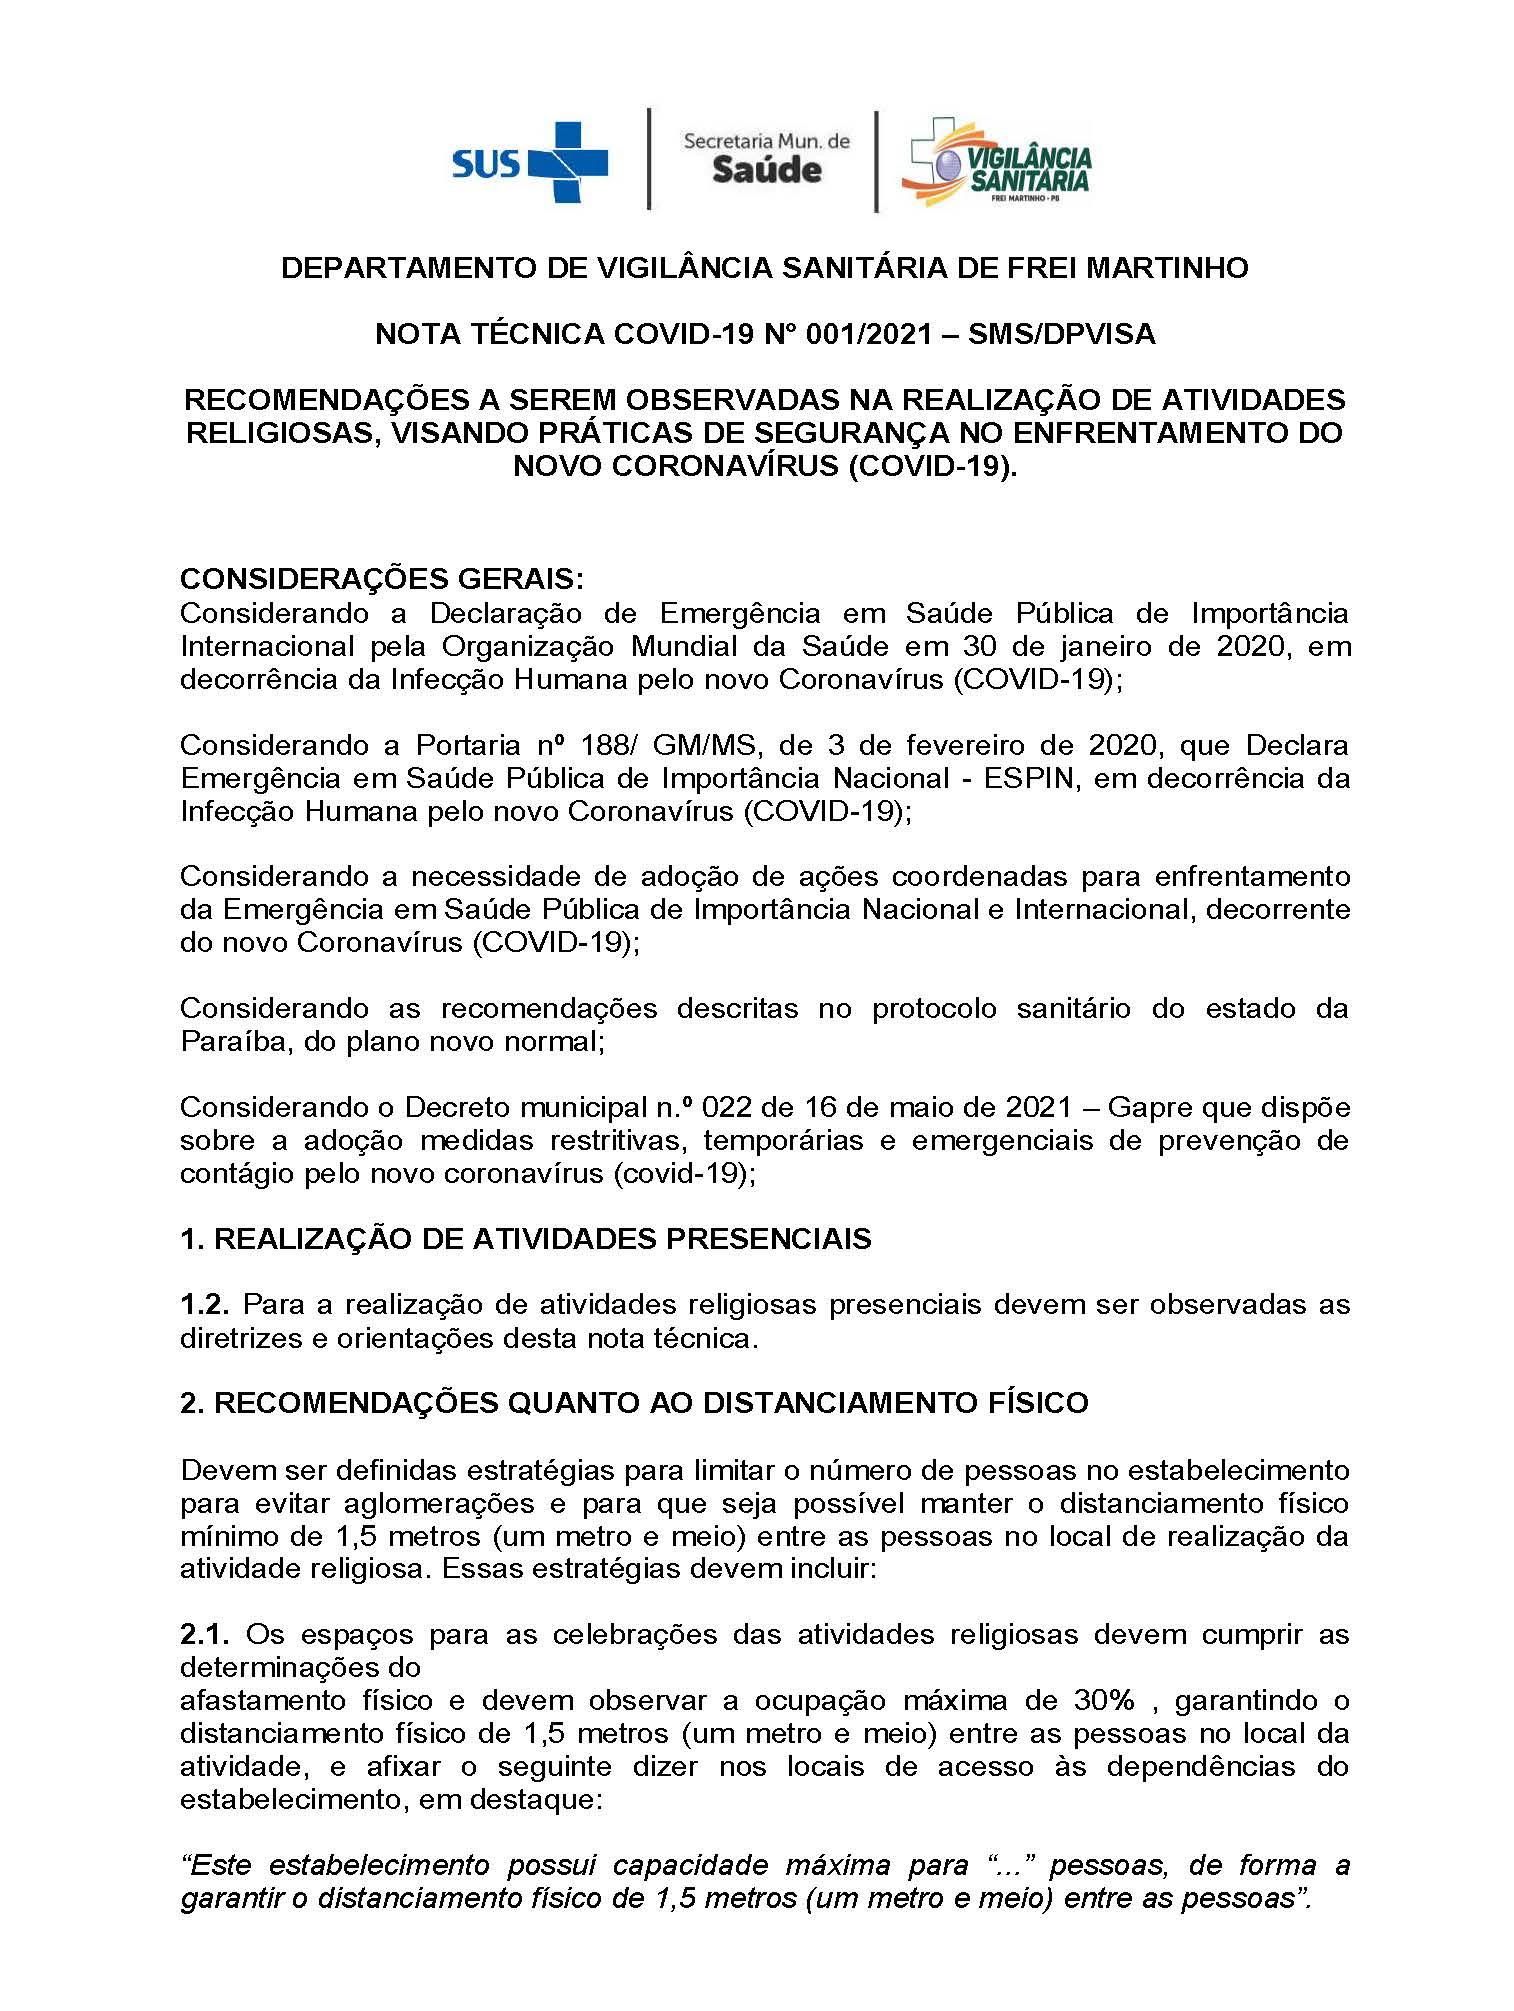 nota-tecnica-visa-001-2021-pagina-1.jpg